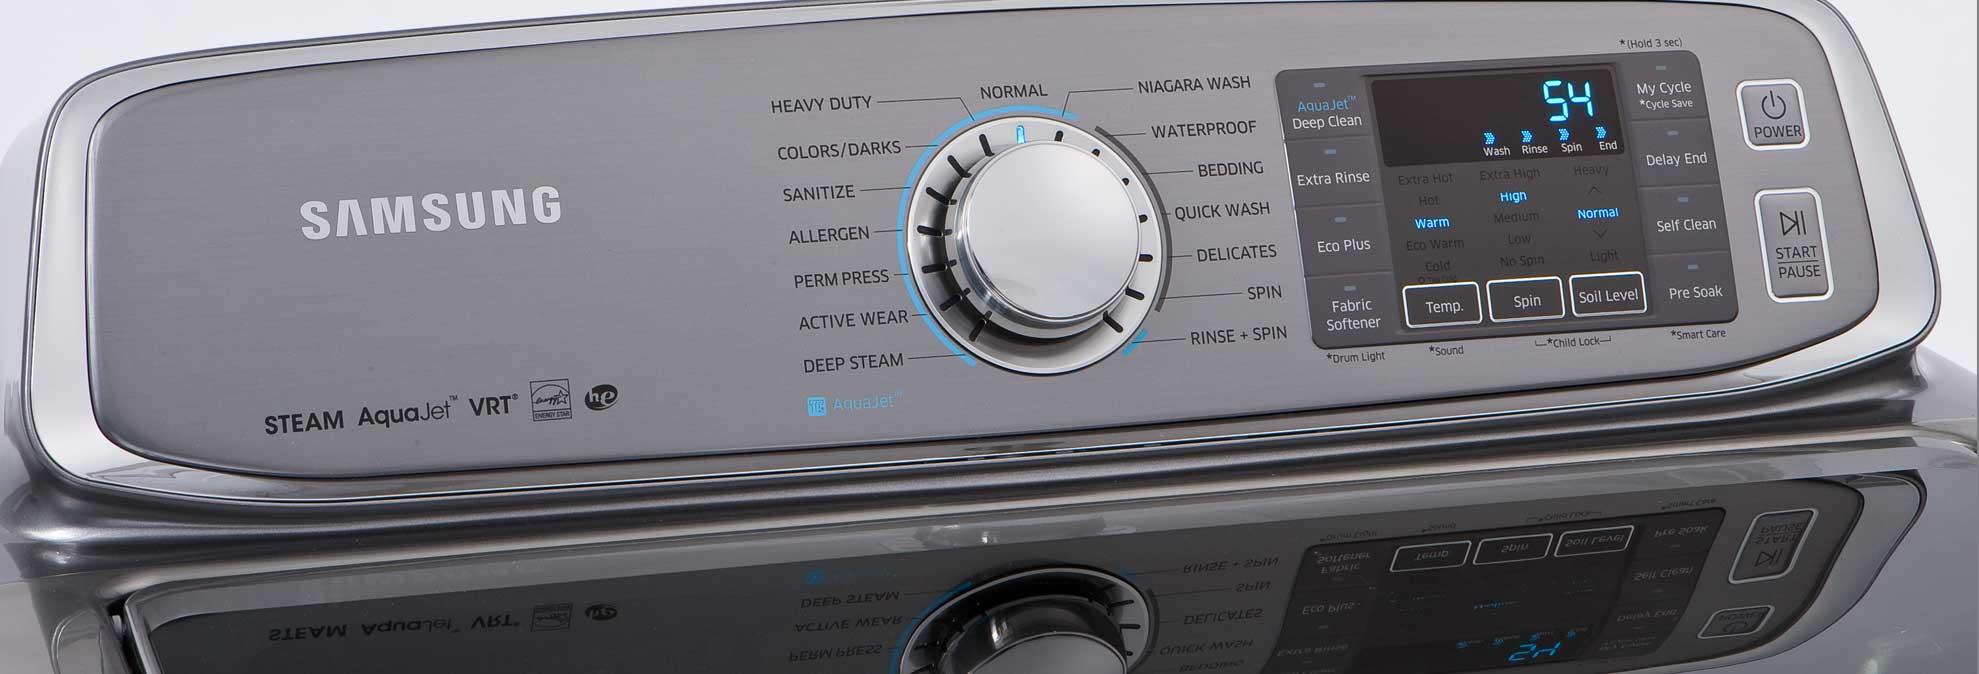 best top loading washing machine consumer reports